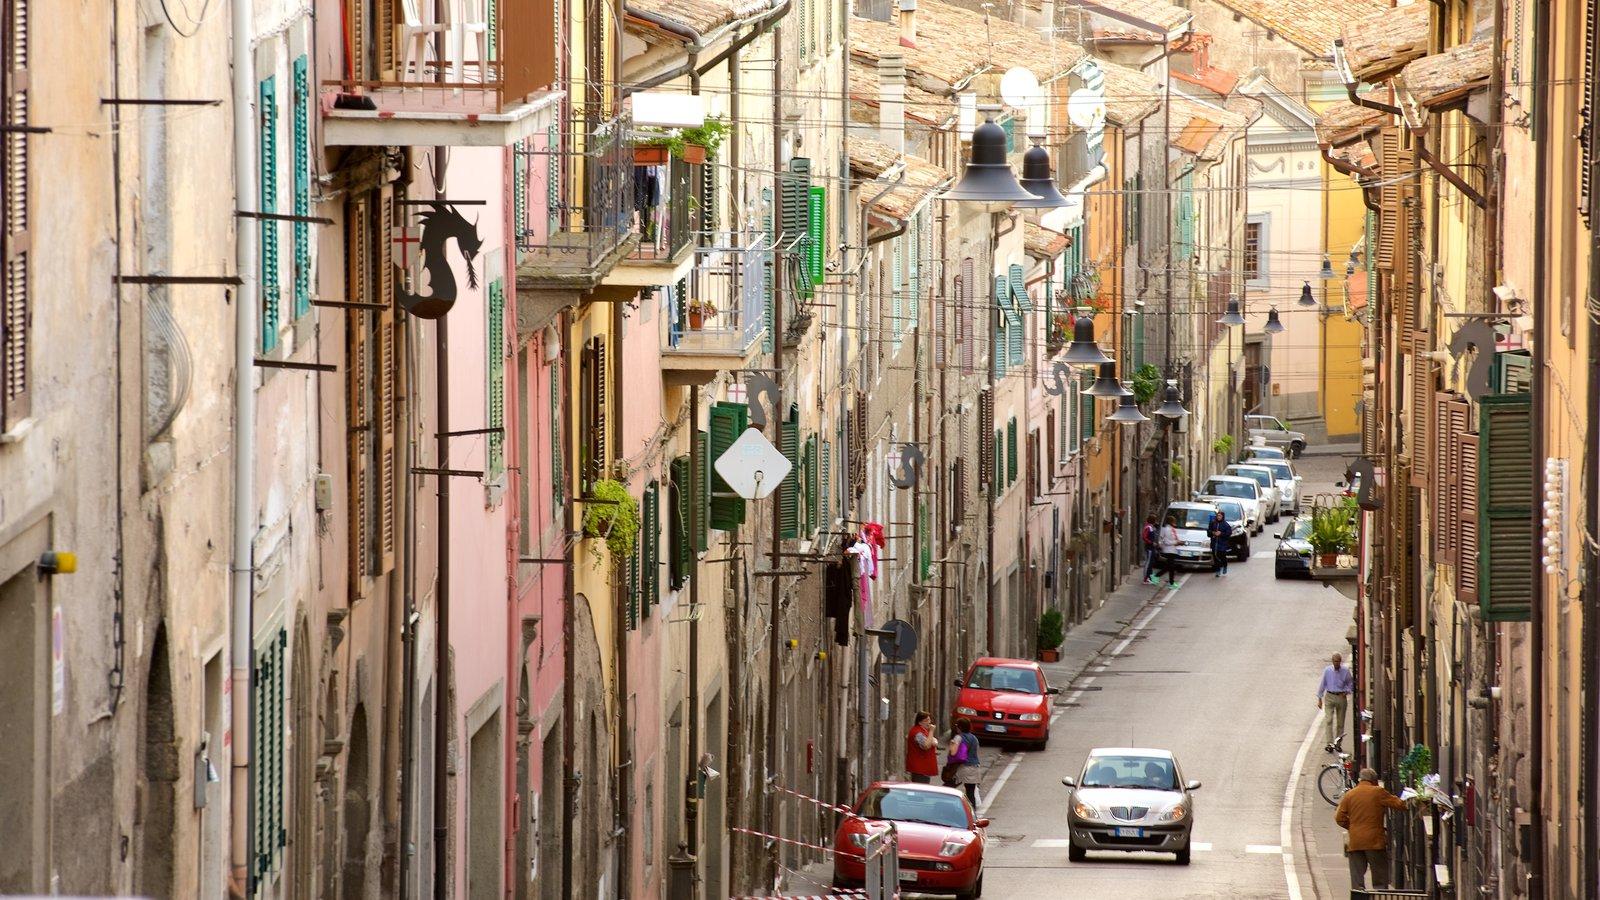 Soriano nel Cimino caracterizando arquitetura de patrimônio